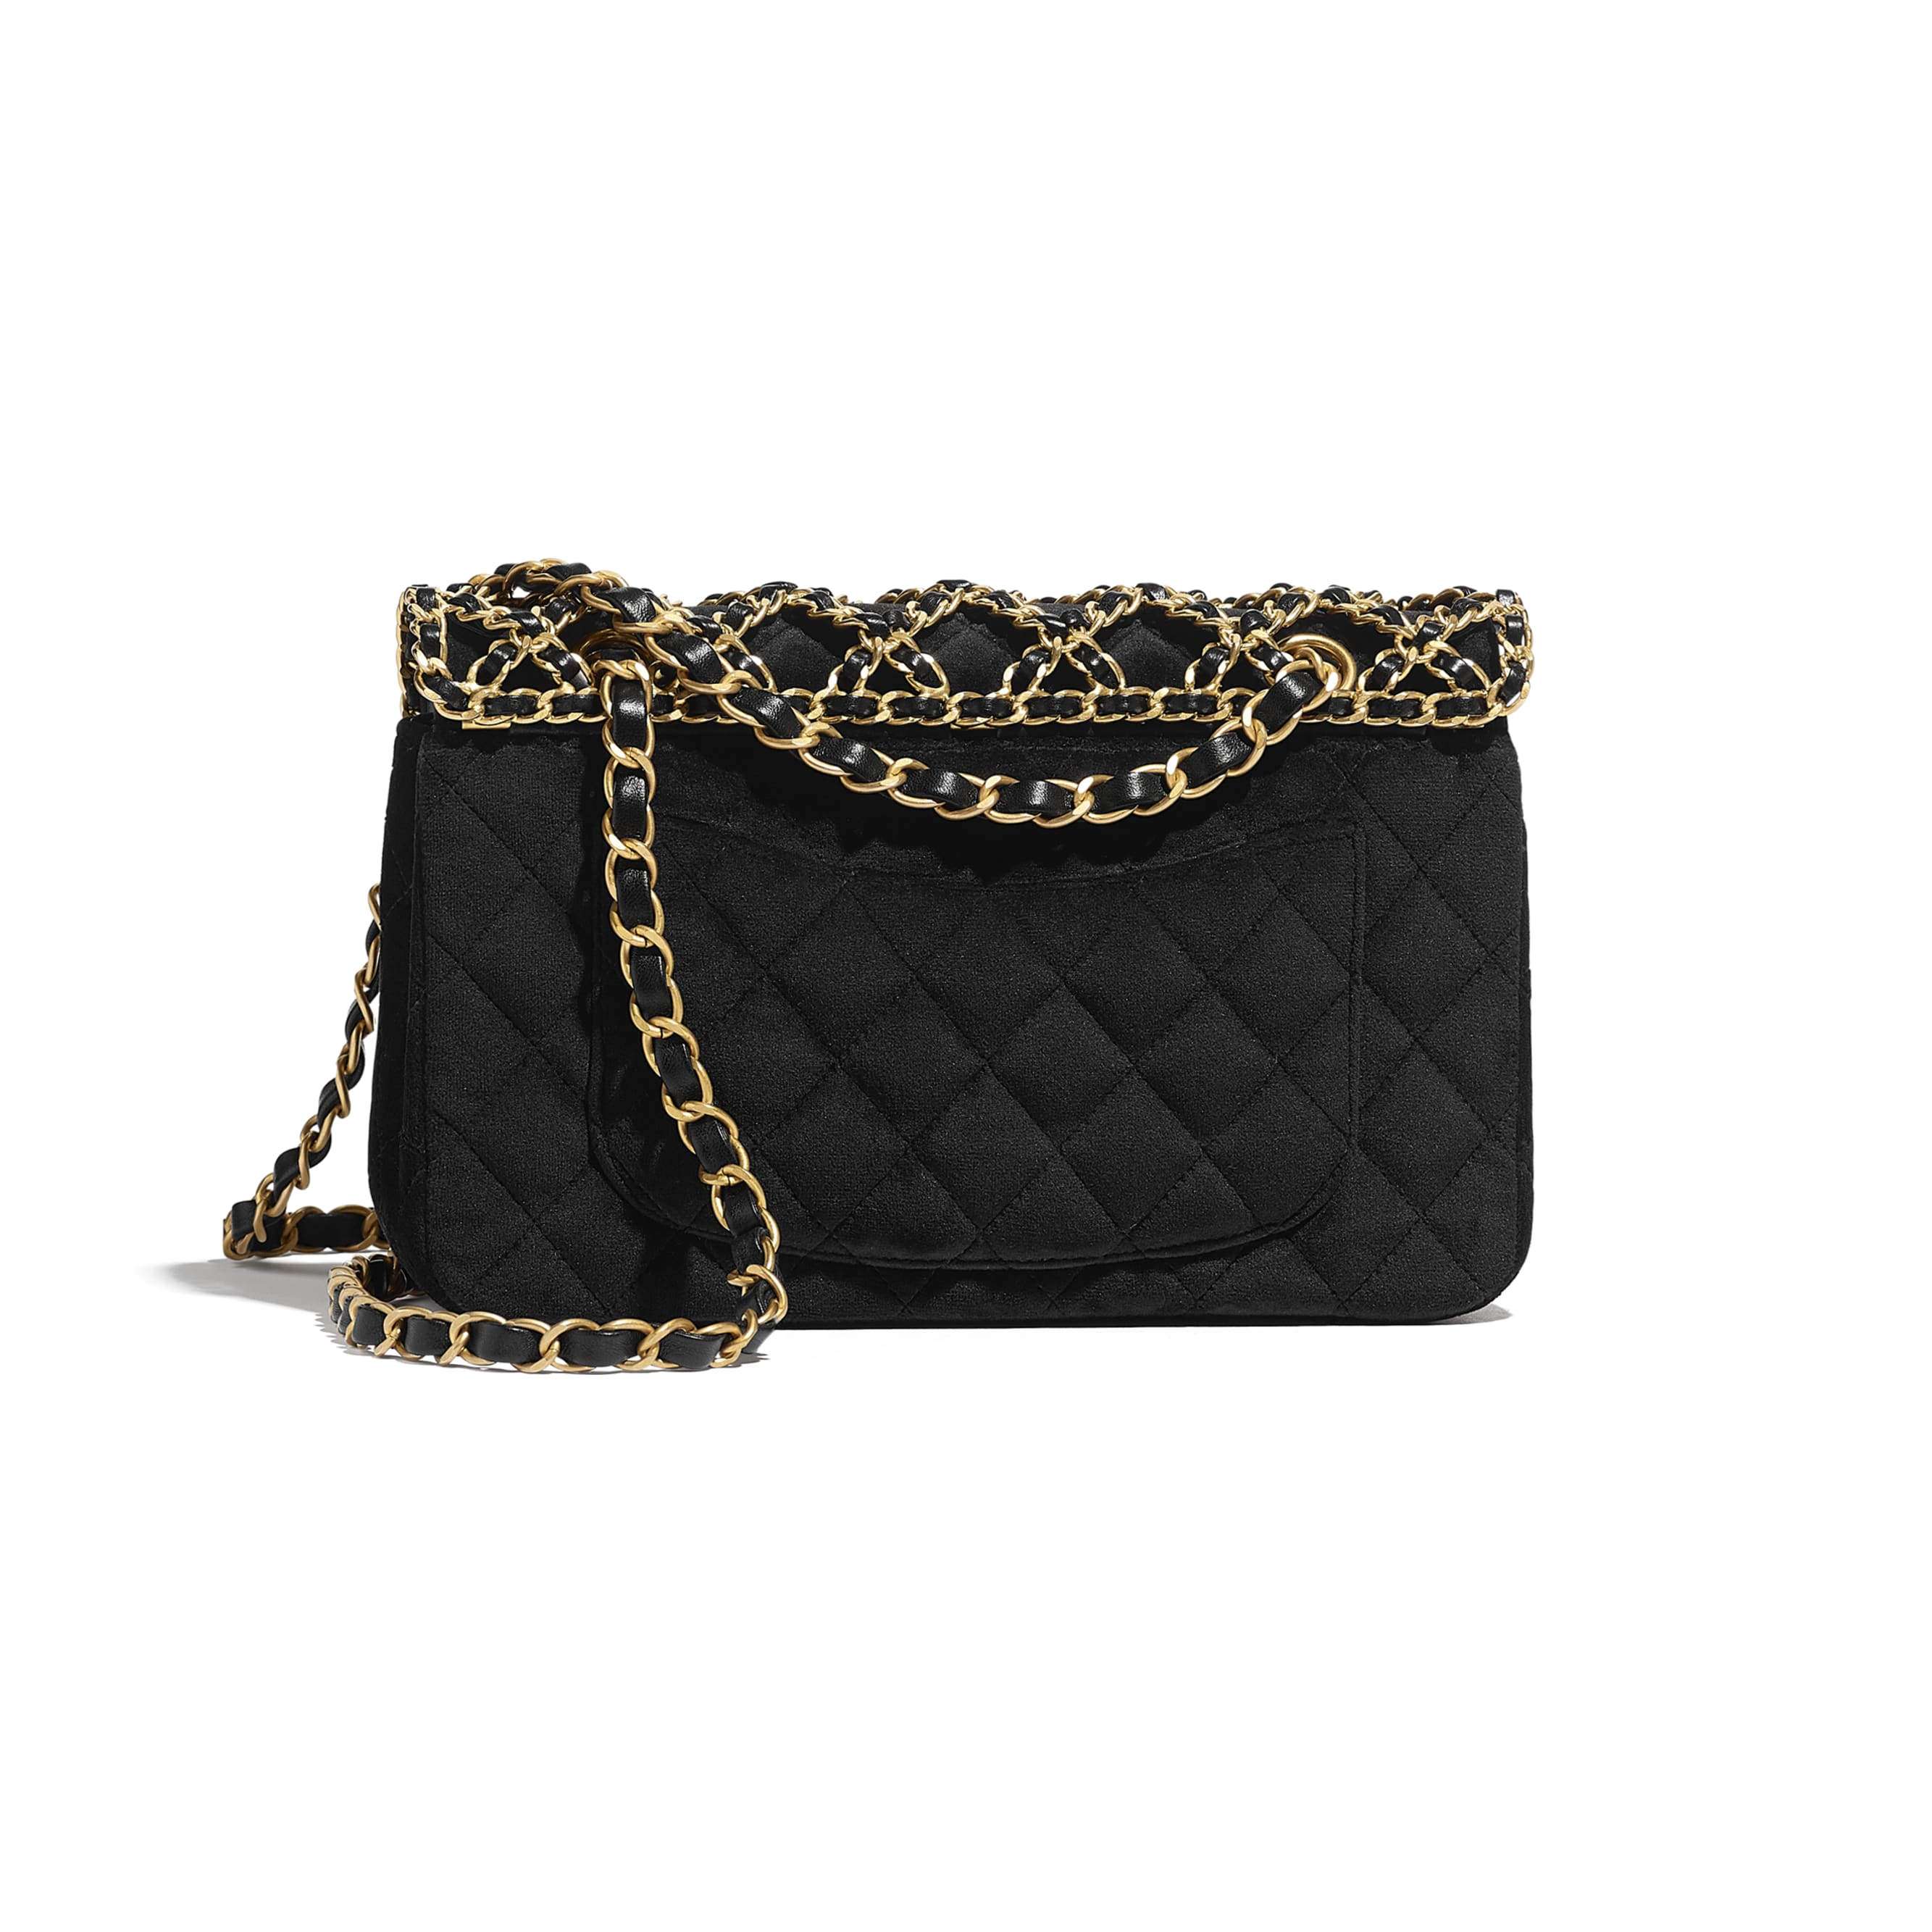 Classic Handbag - Black - Velvet & Gold Metal - CHANEL - Alternative view - see standard sized version